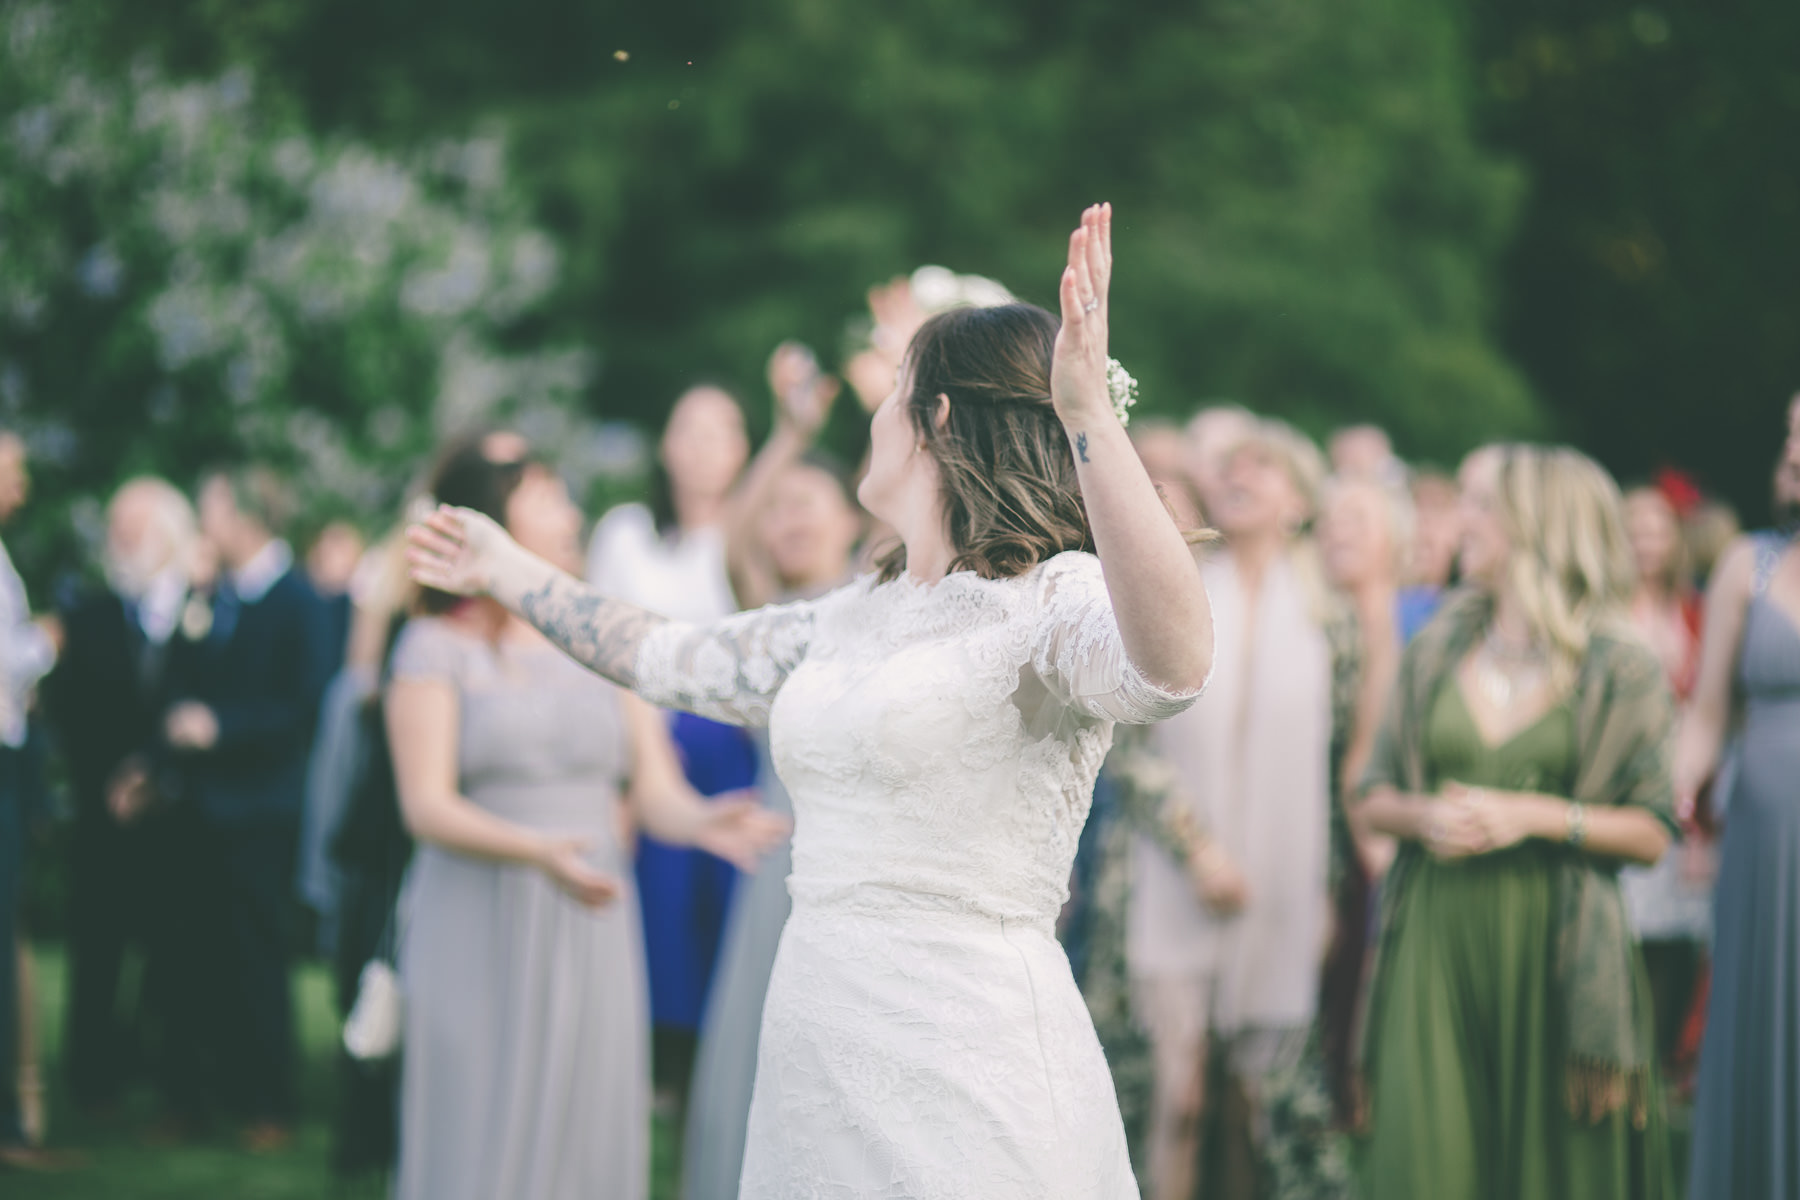 Pamber-Place-wedding-photography-basingstoke-hampshire-209